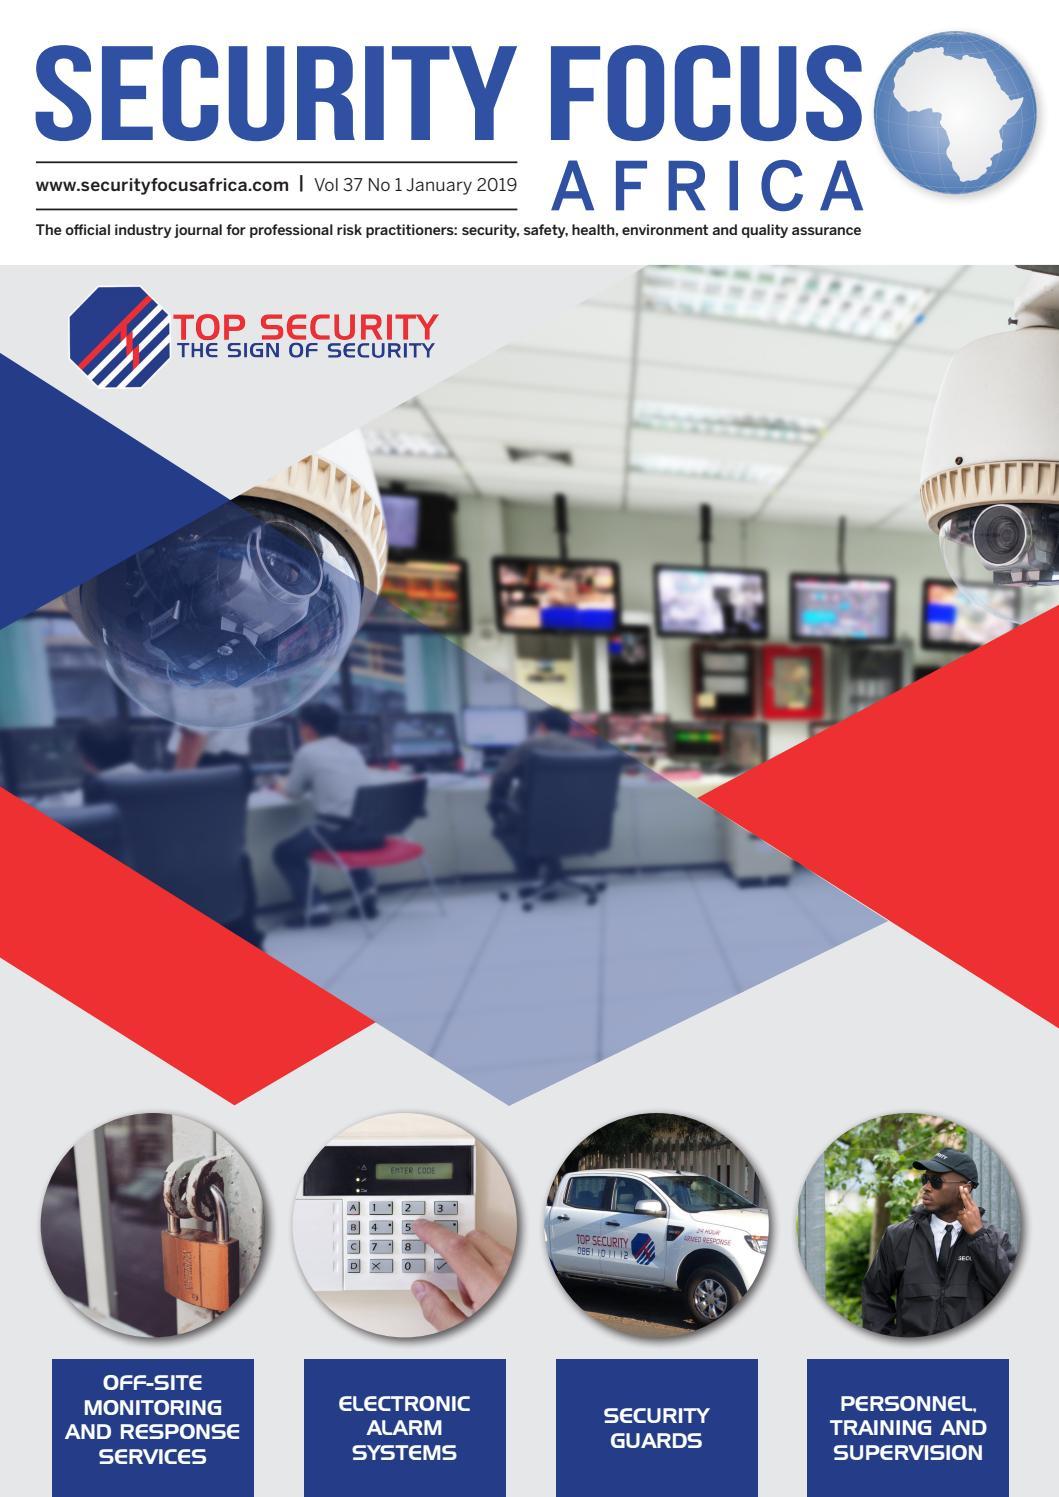 Africat Porno 1080P security focus africa january 2019contact publications